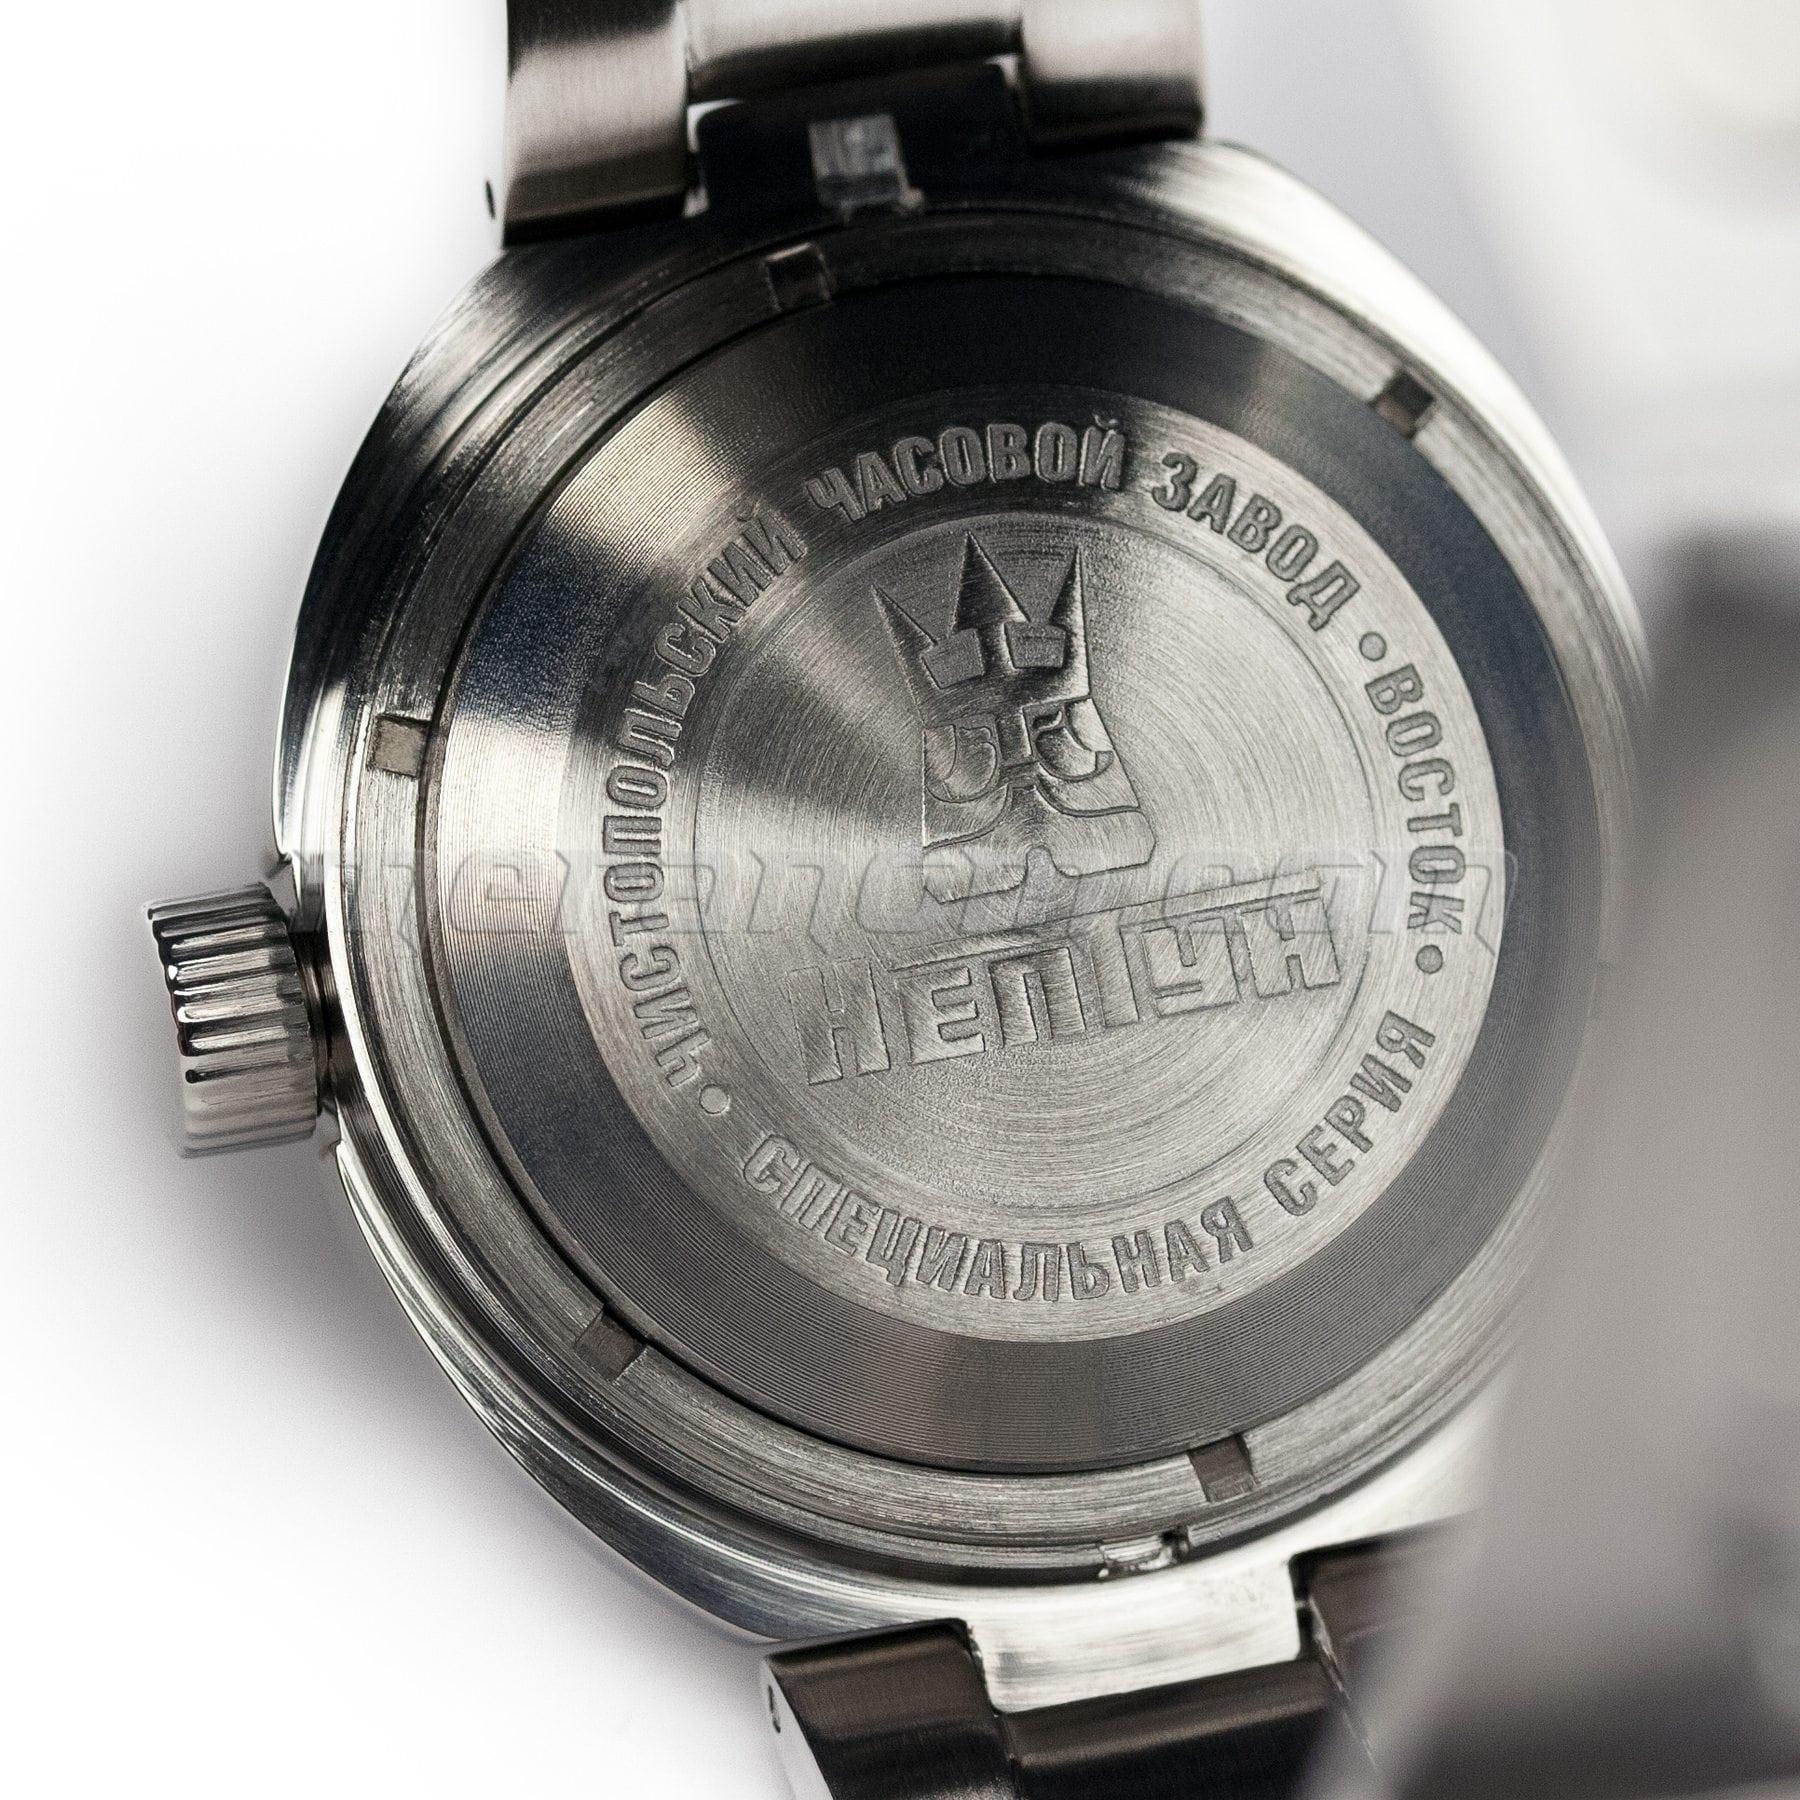 Vostok Relojes Neptun Se 960725 Compra A Un Distribuidor